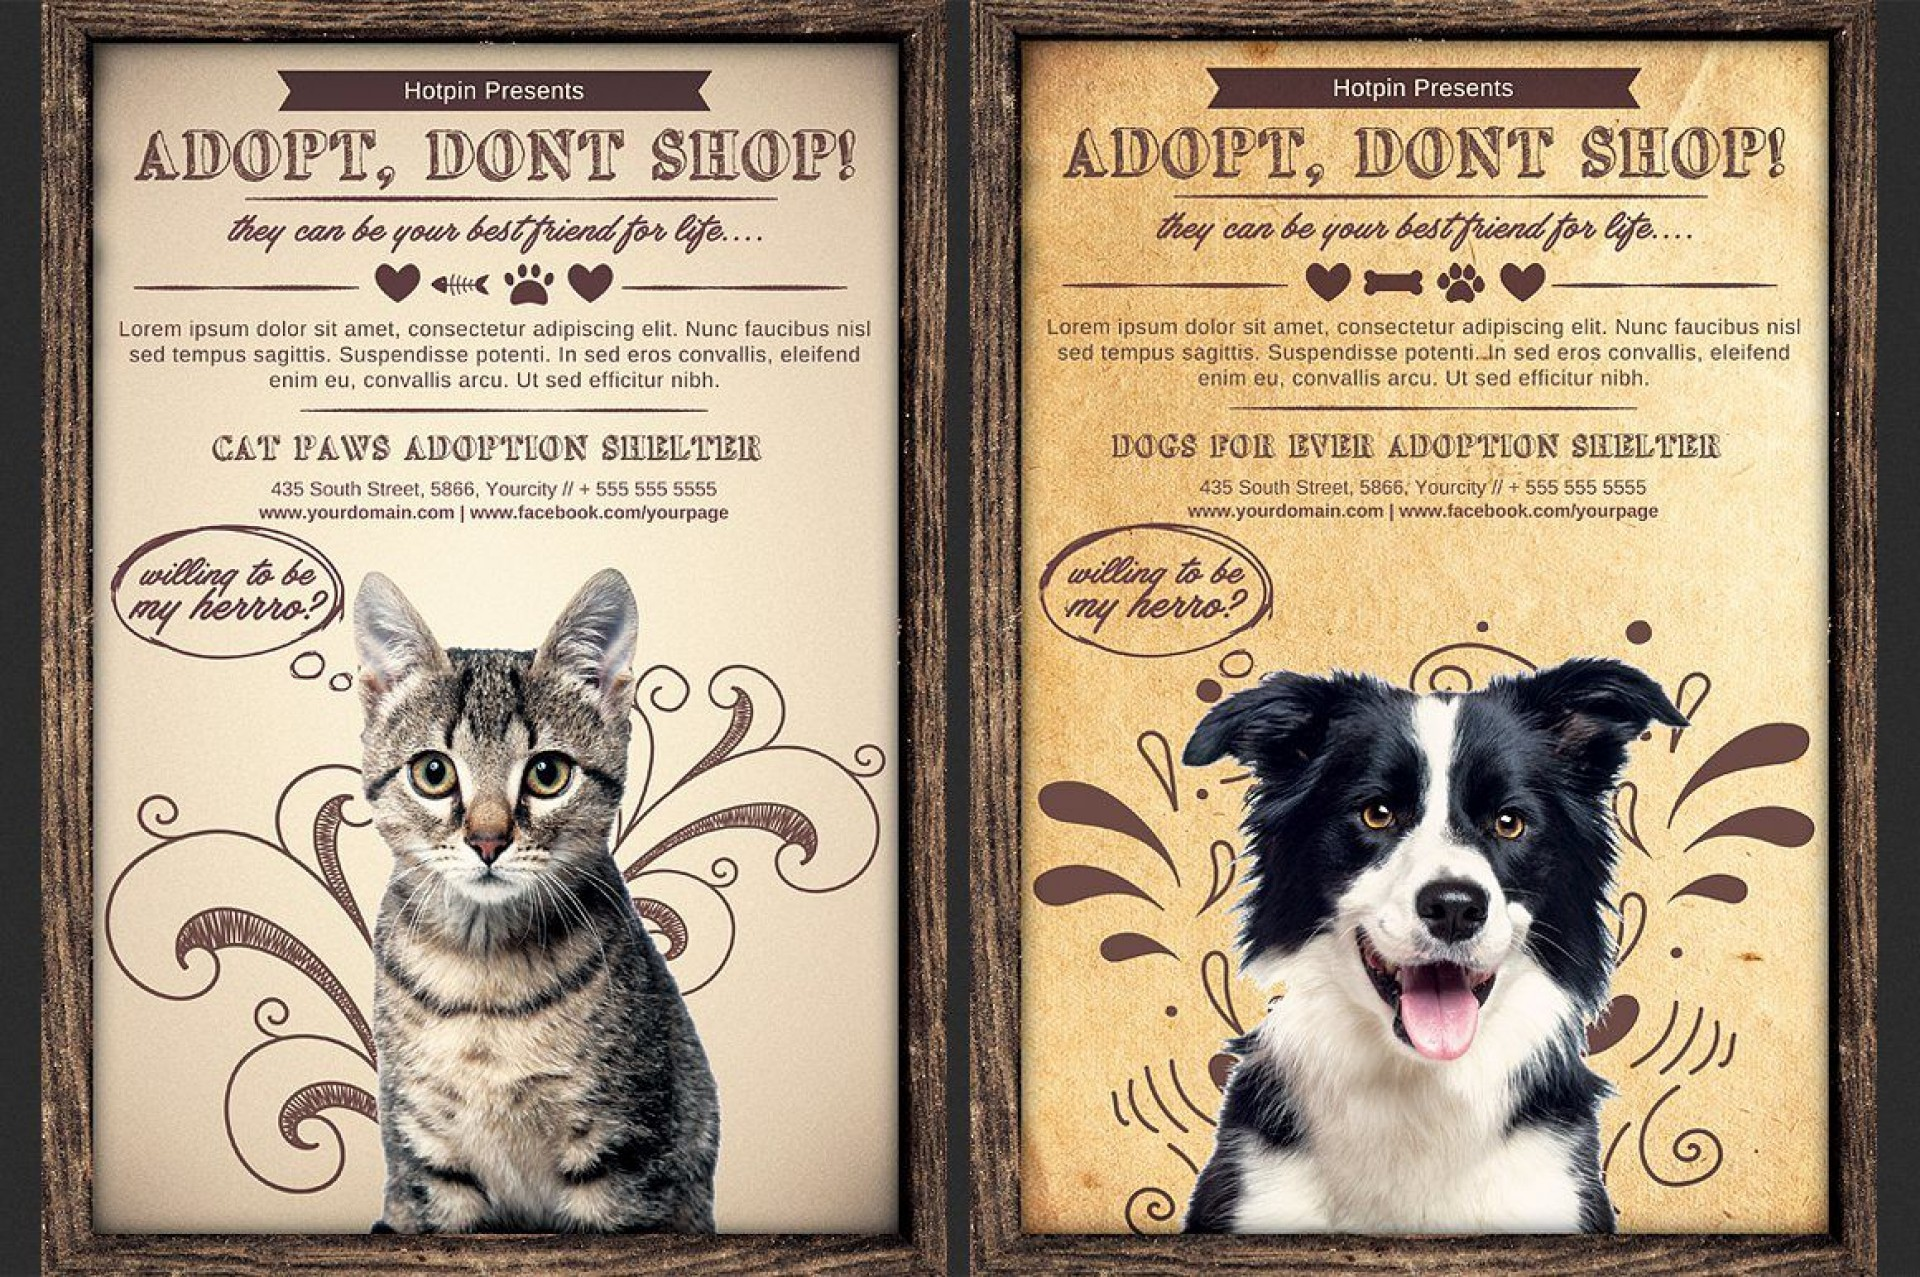 009 Unforgettable Pet Adoption Flyer Template High Resolution  Free Event Dog1920